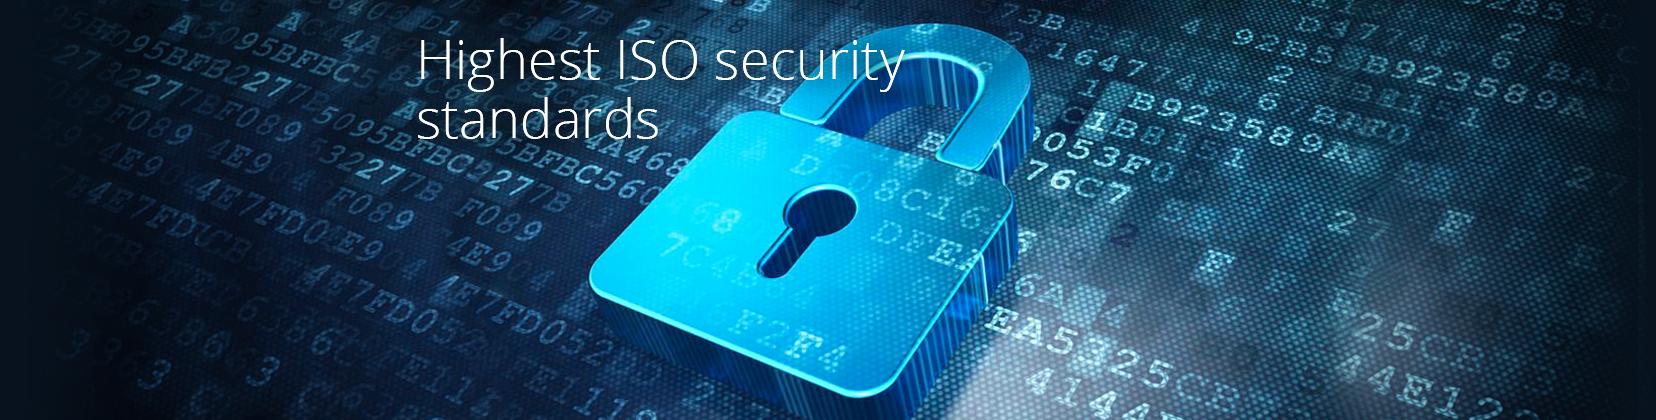 PIS ISO standardi